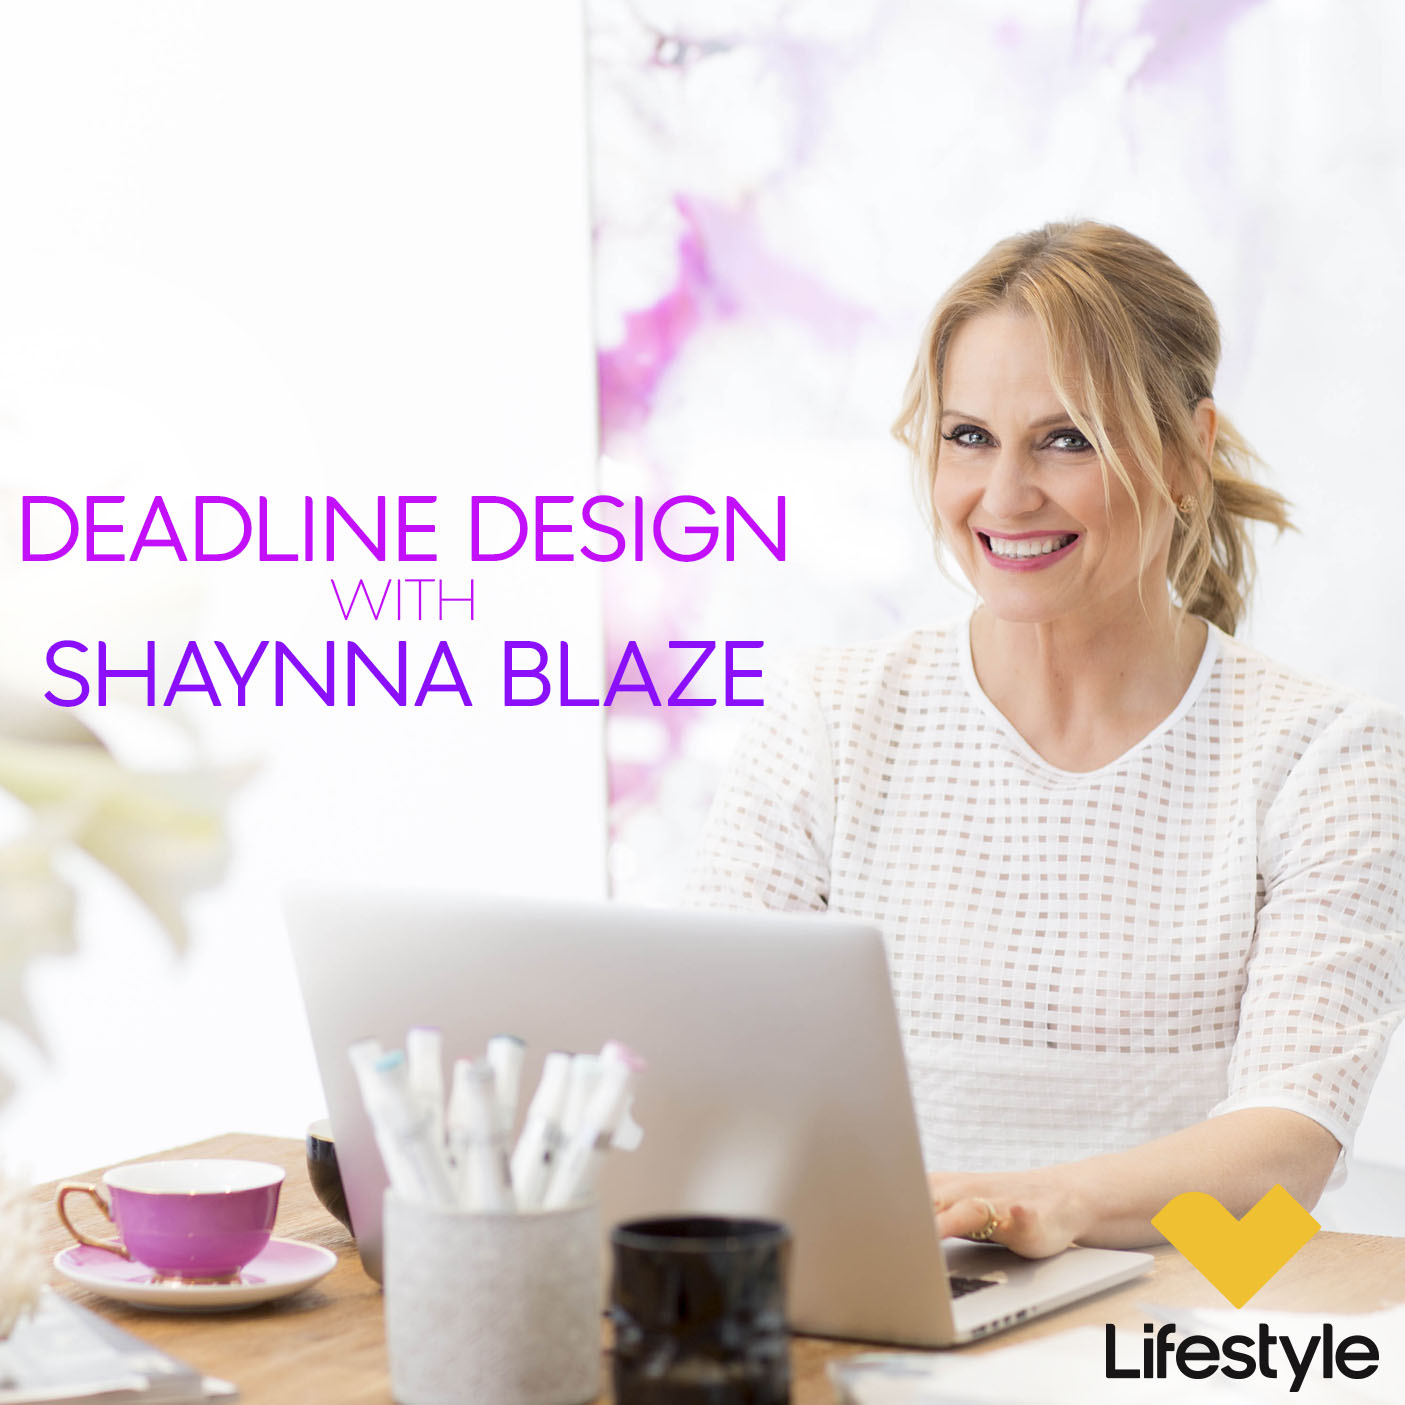 Shaynna Blaze on Deadline Design